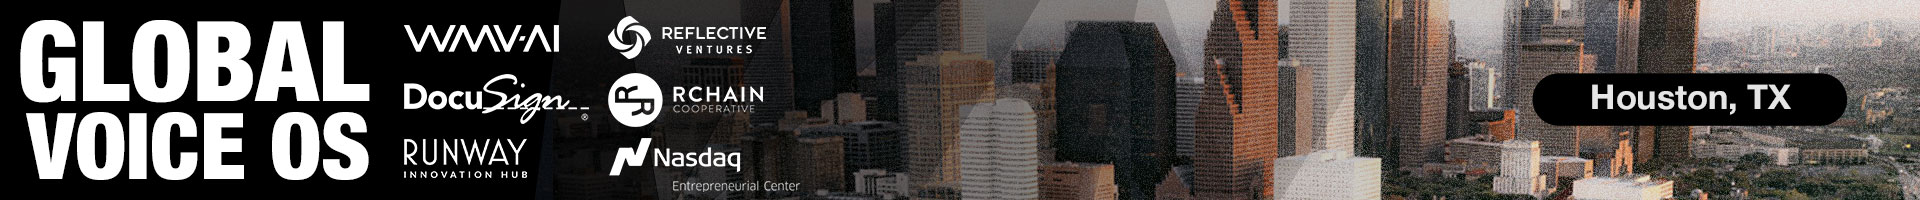 Event-Global-Voice-OS-1920x200-Houston-TX